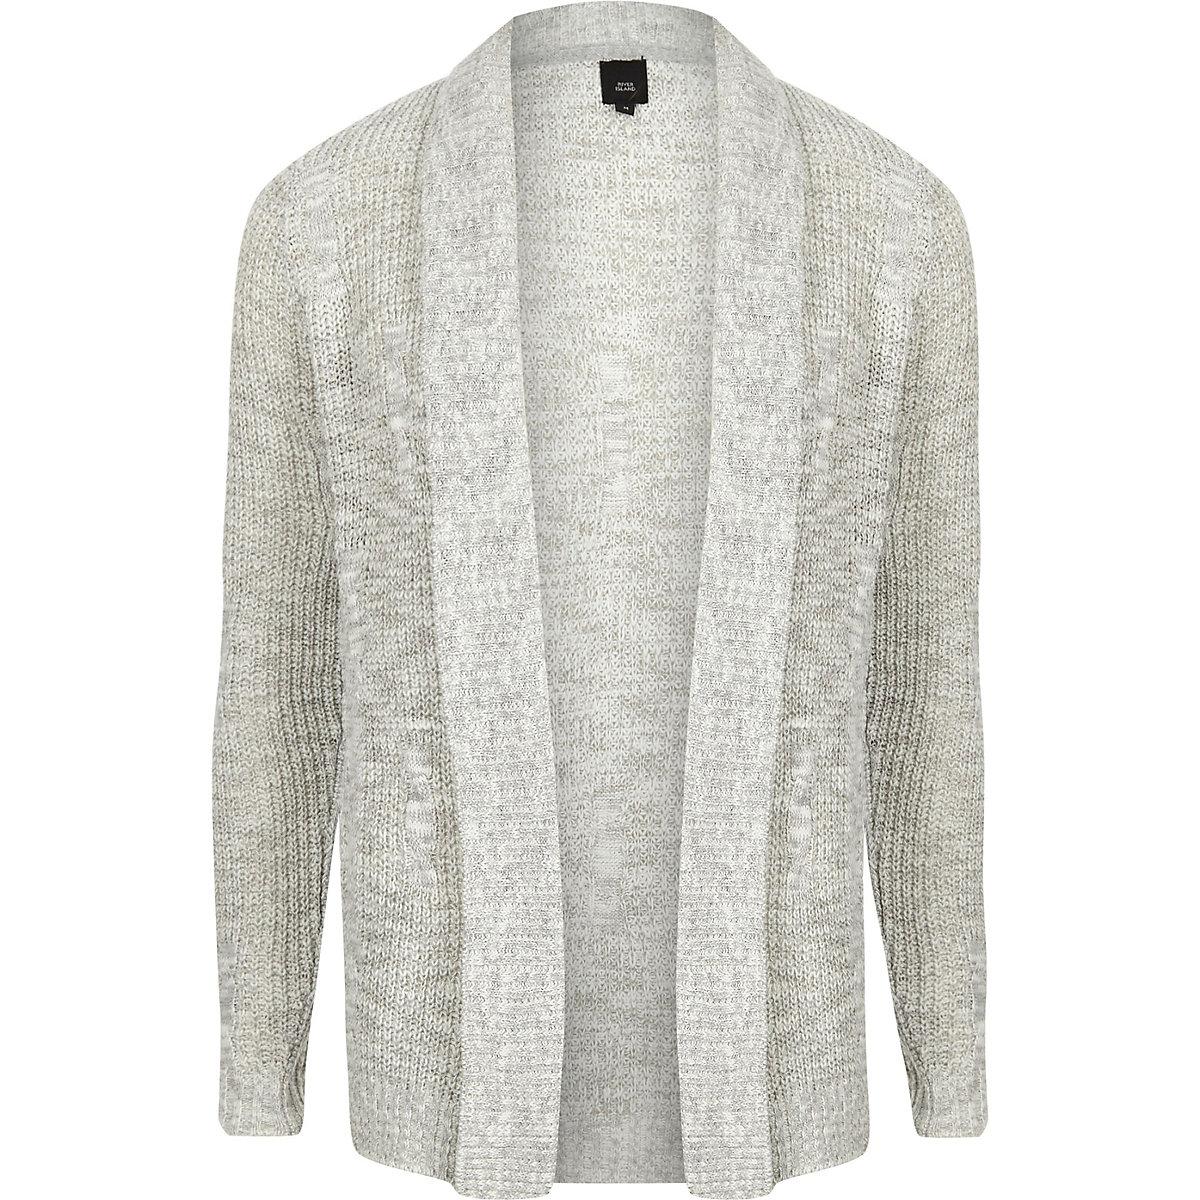 Big and Tall grey knit cardigan